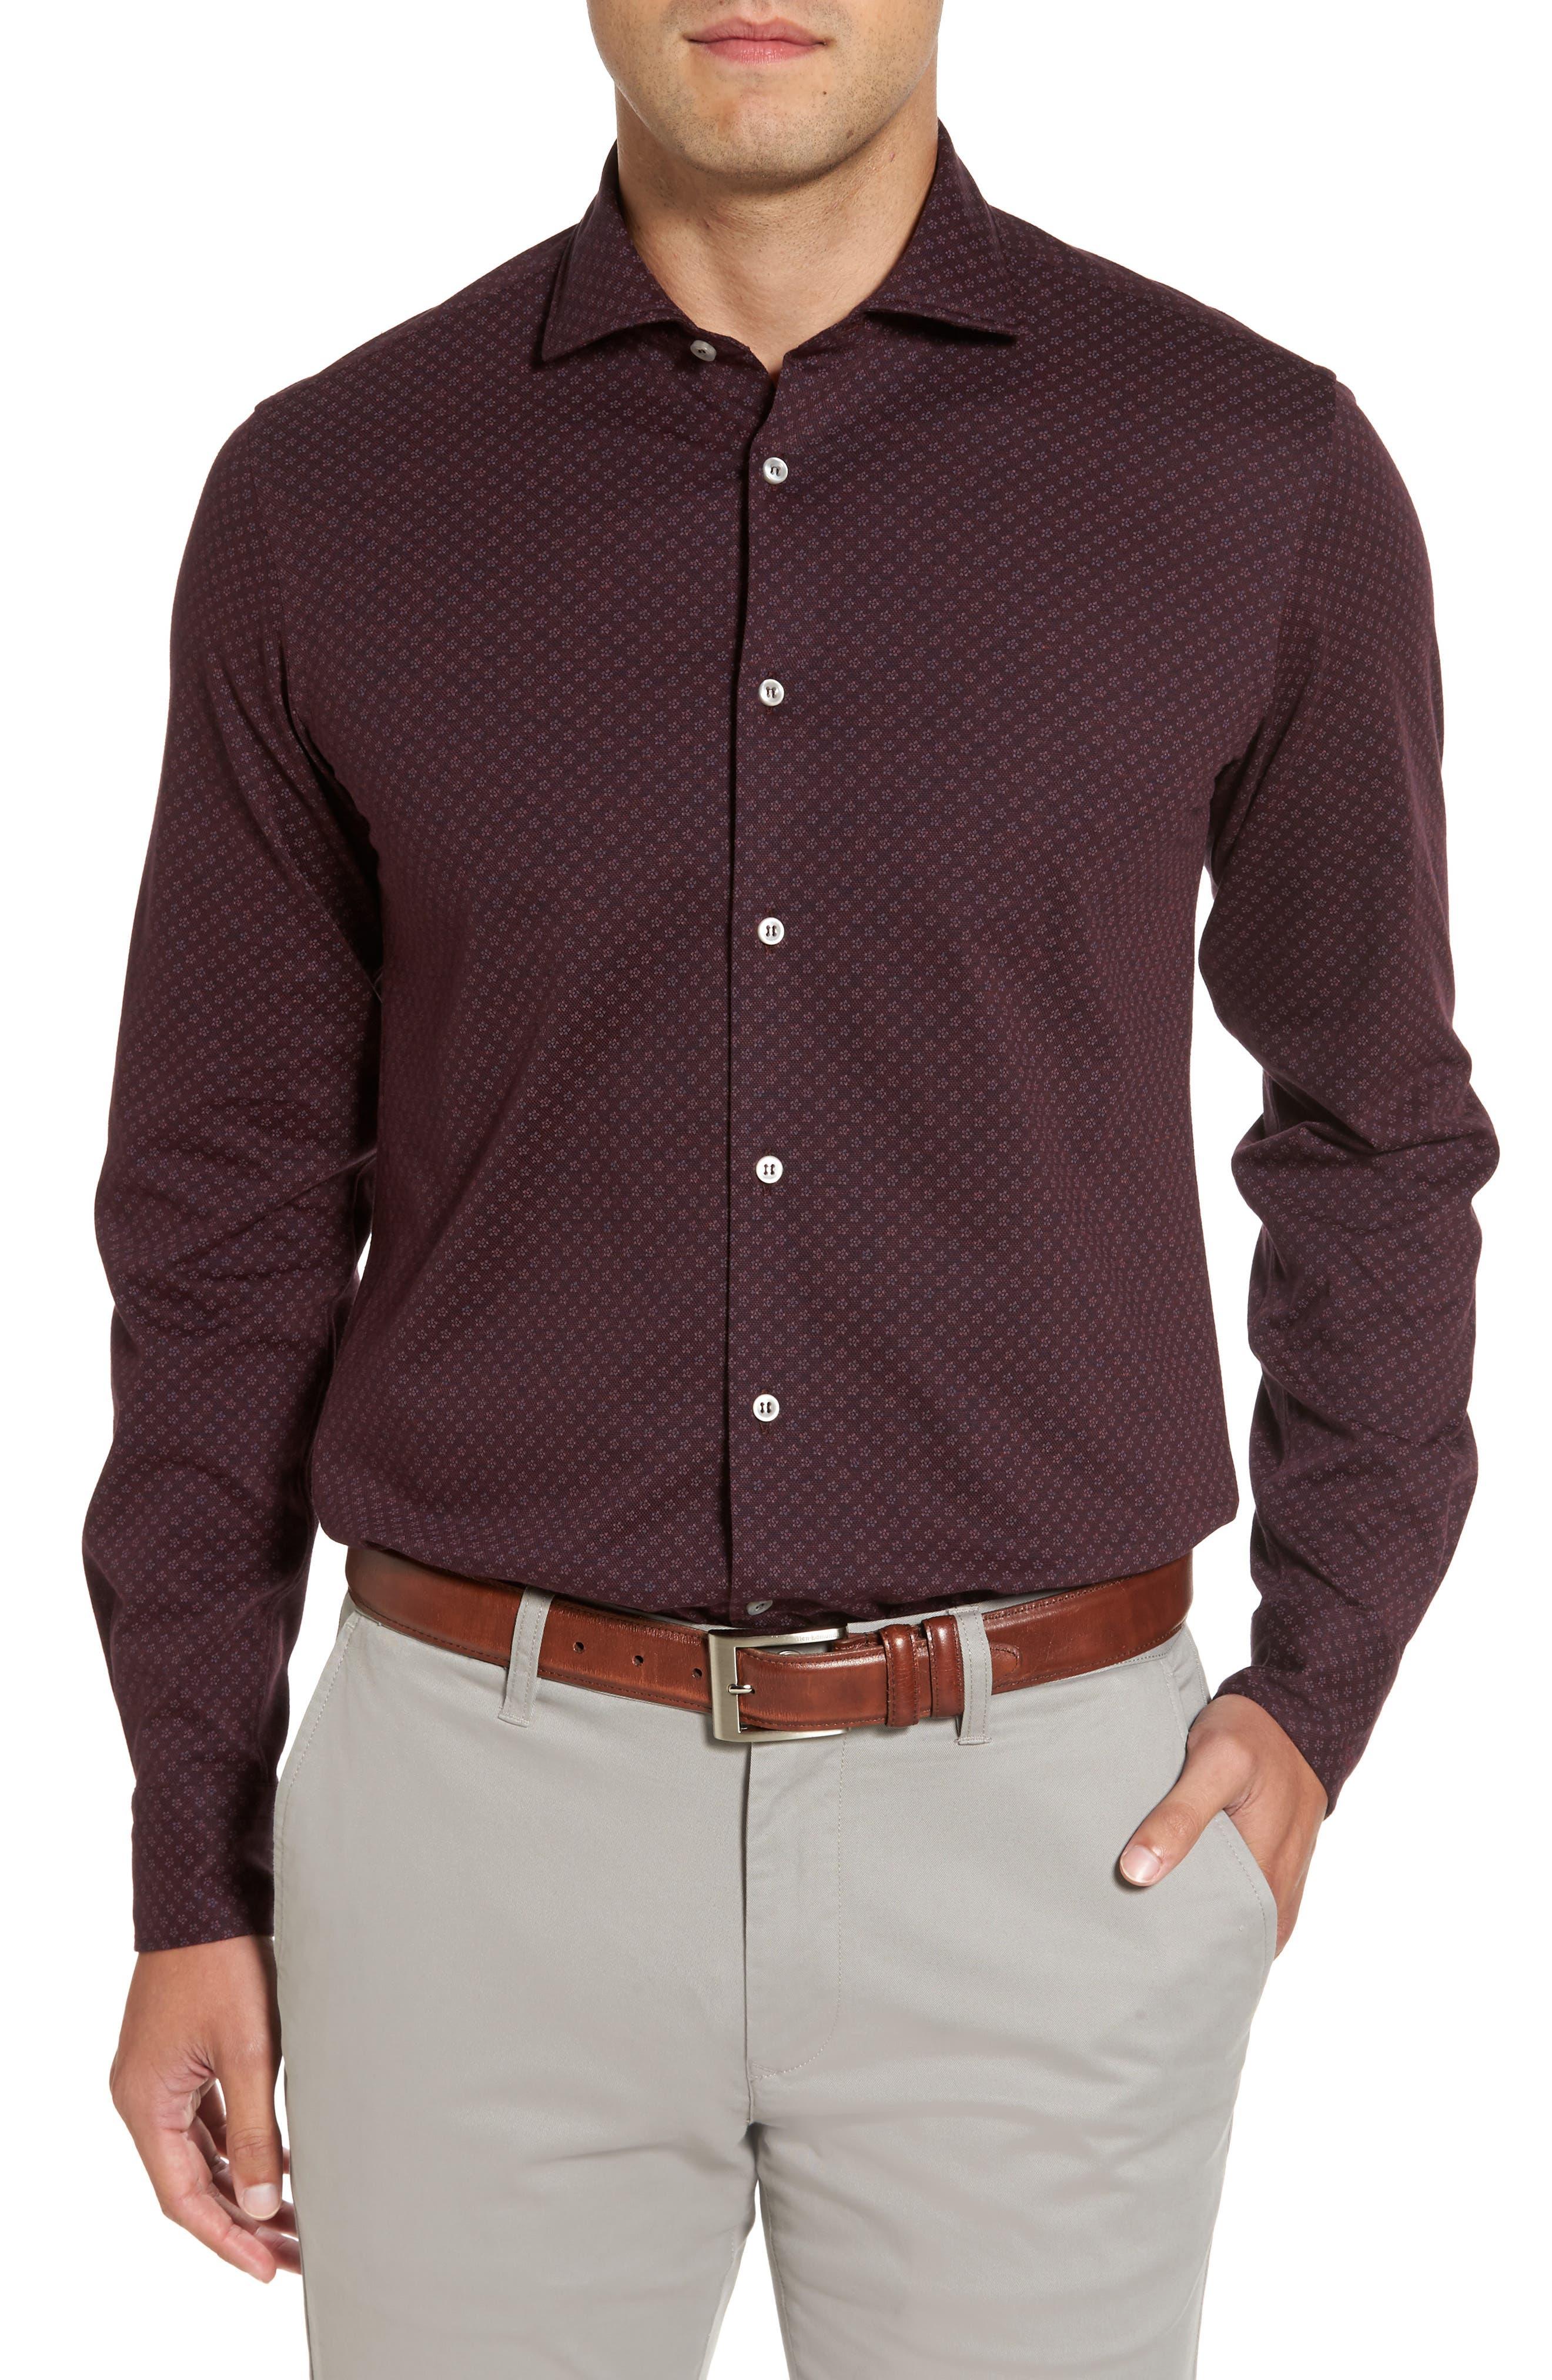 Paul&Shark Floral Print Knit Sports Shirt,                         Main,                         color, Burgundy